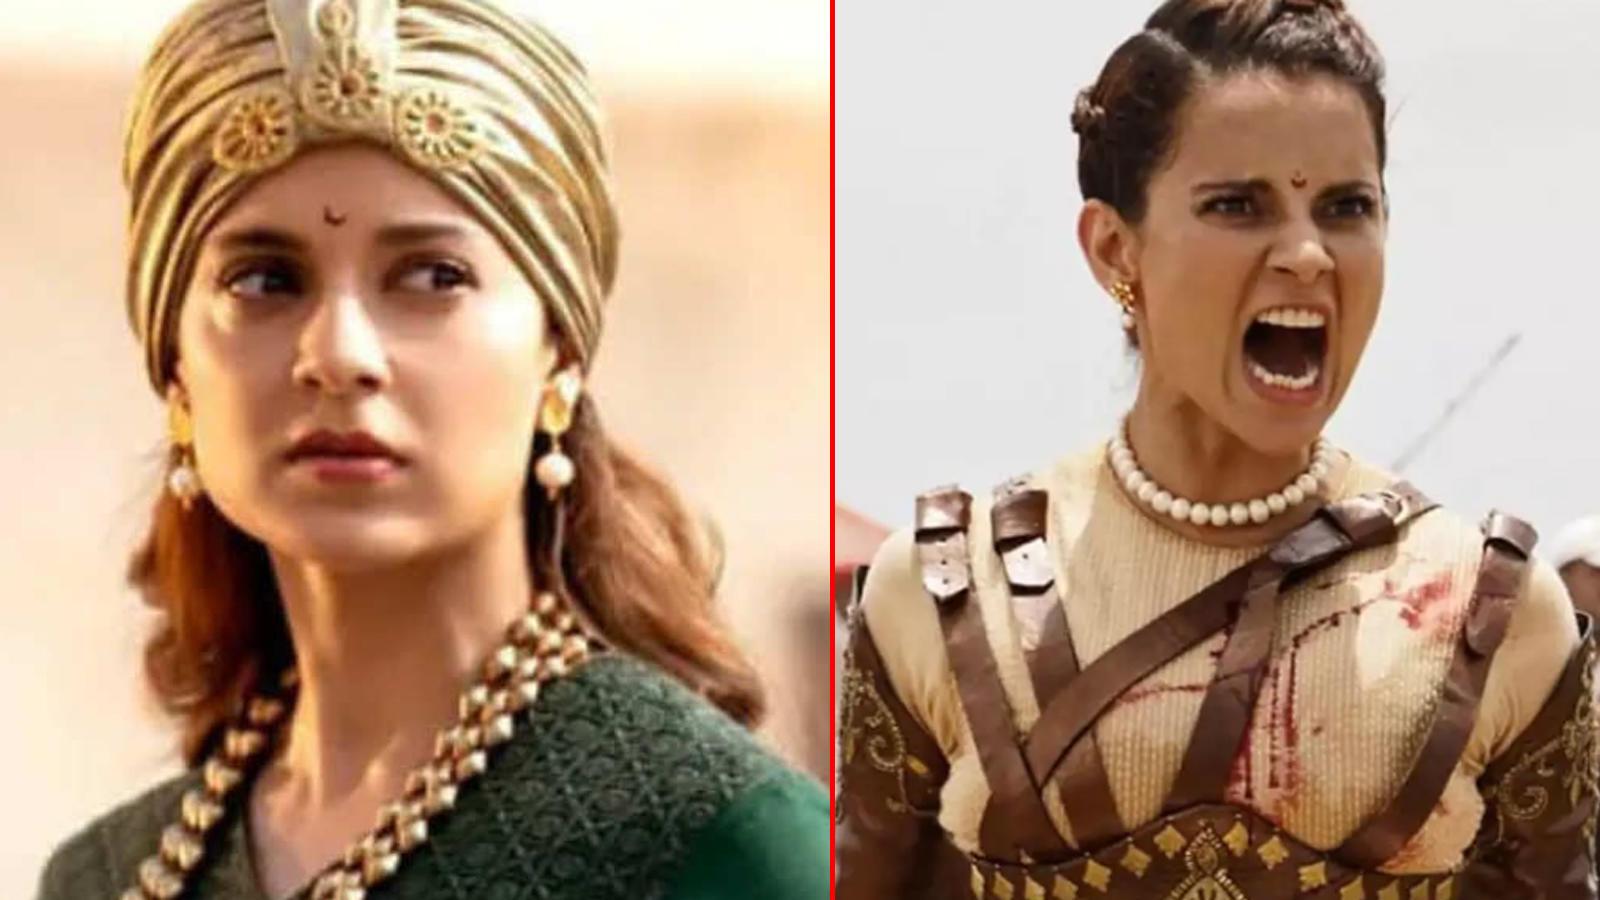 manikarnika-row-kangana-ranaut-warns-karni-sena-says-she-will-destroy-them